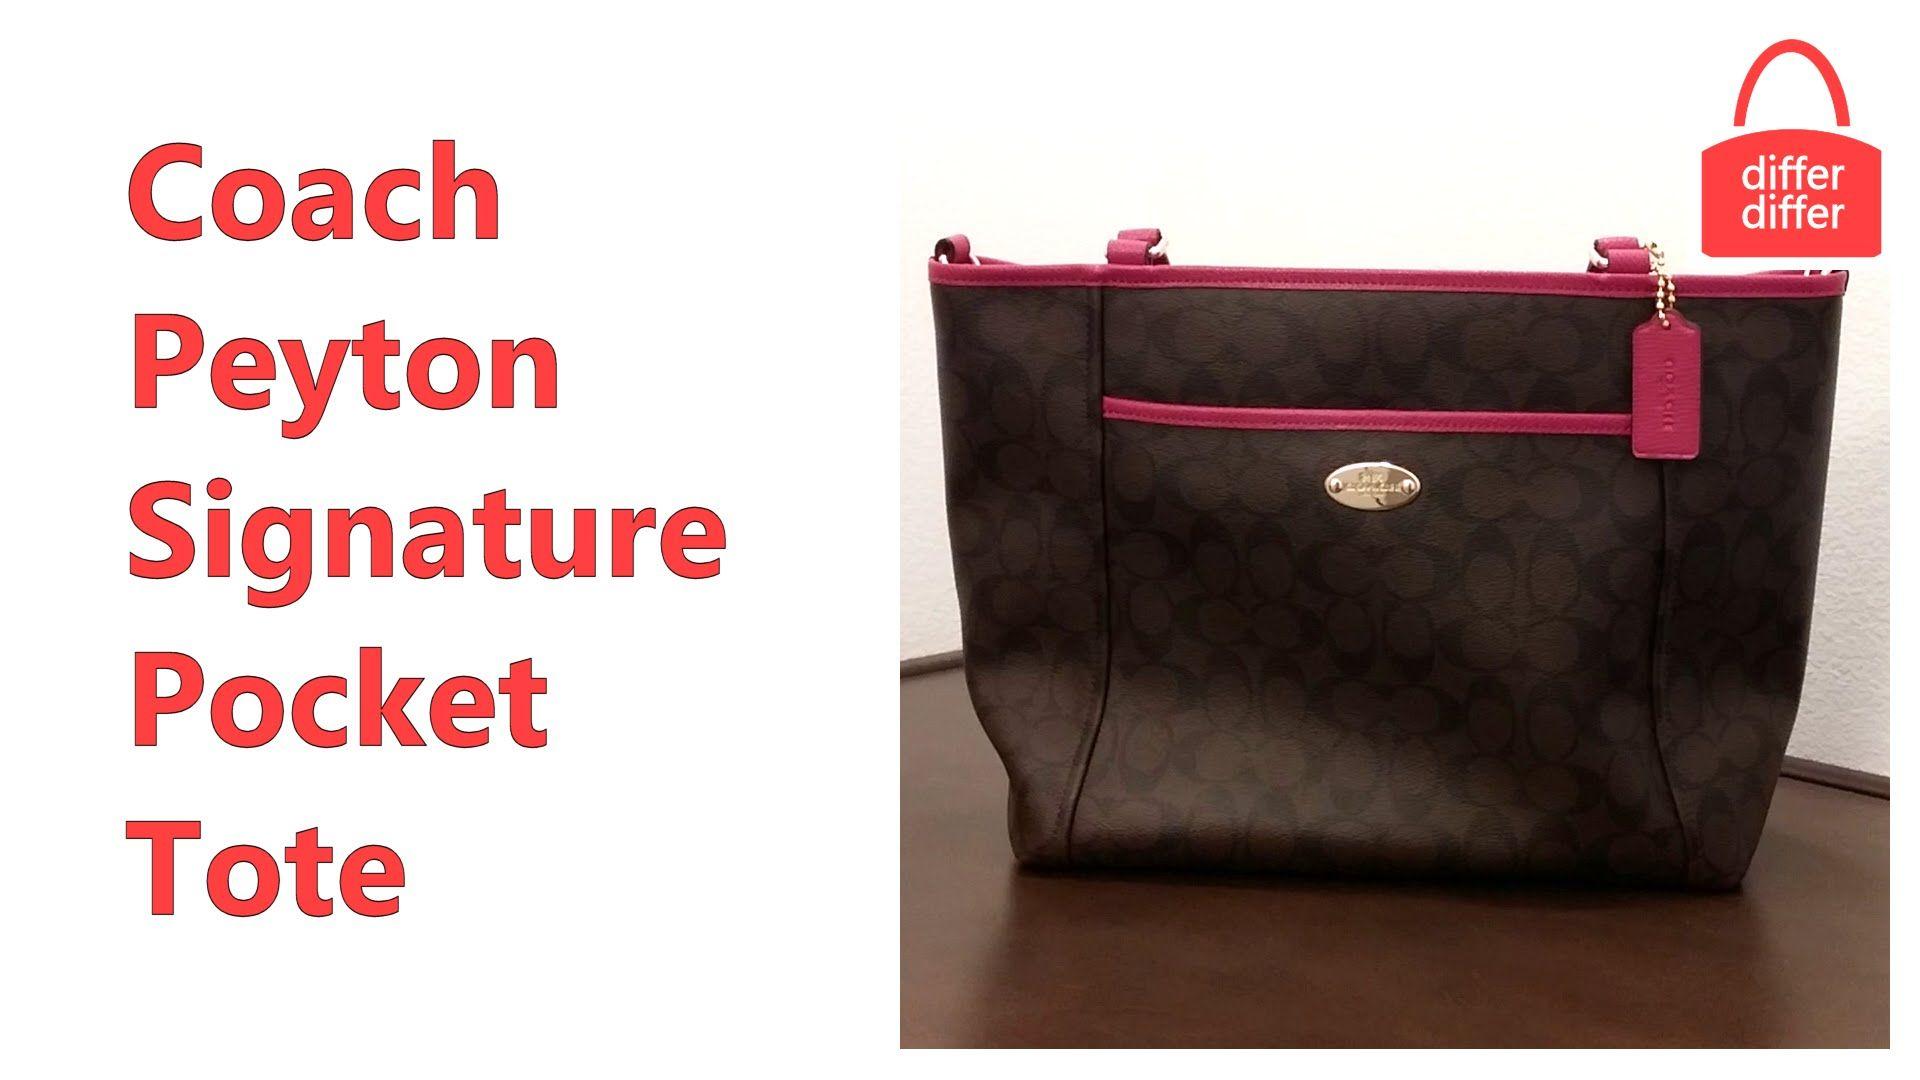 Coach Peyton Signature Pocket Tote handbag videos Pinterest